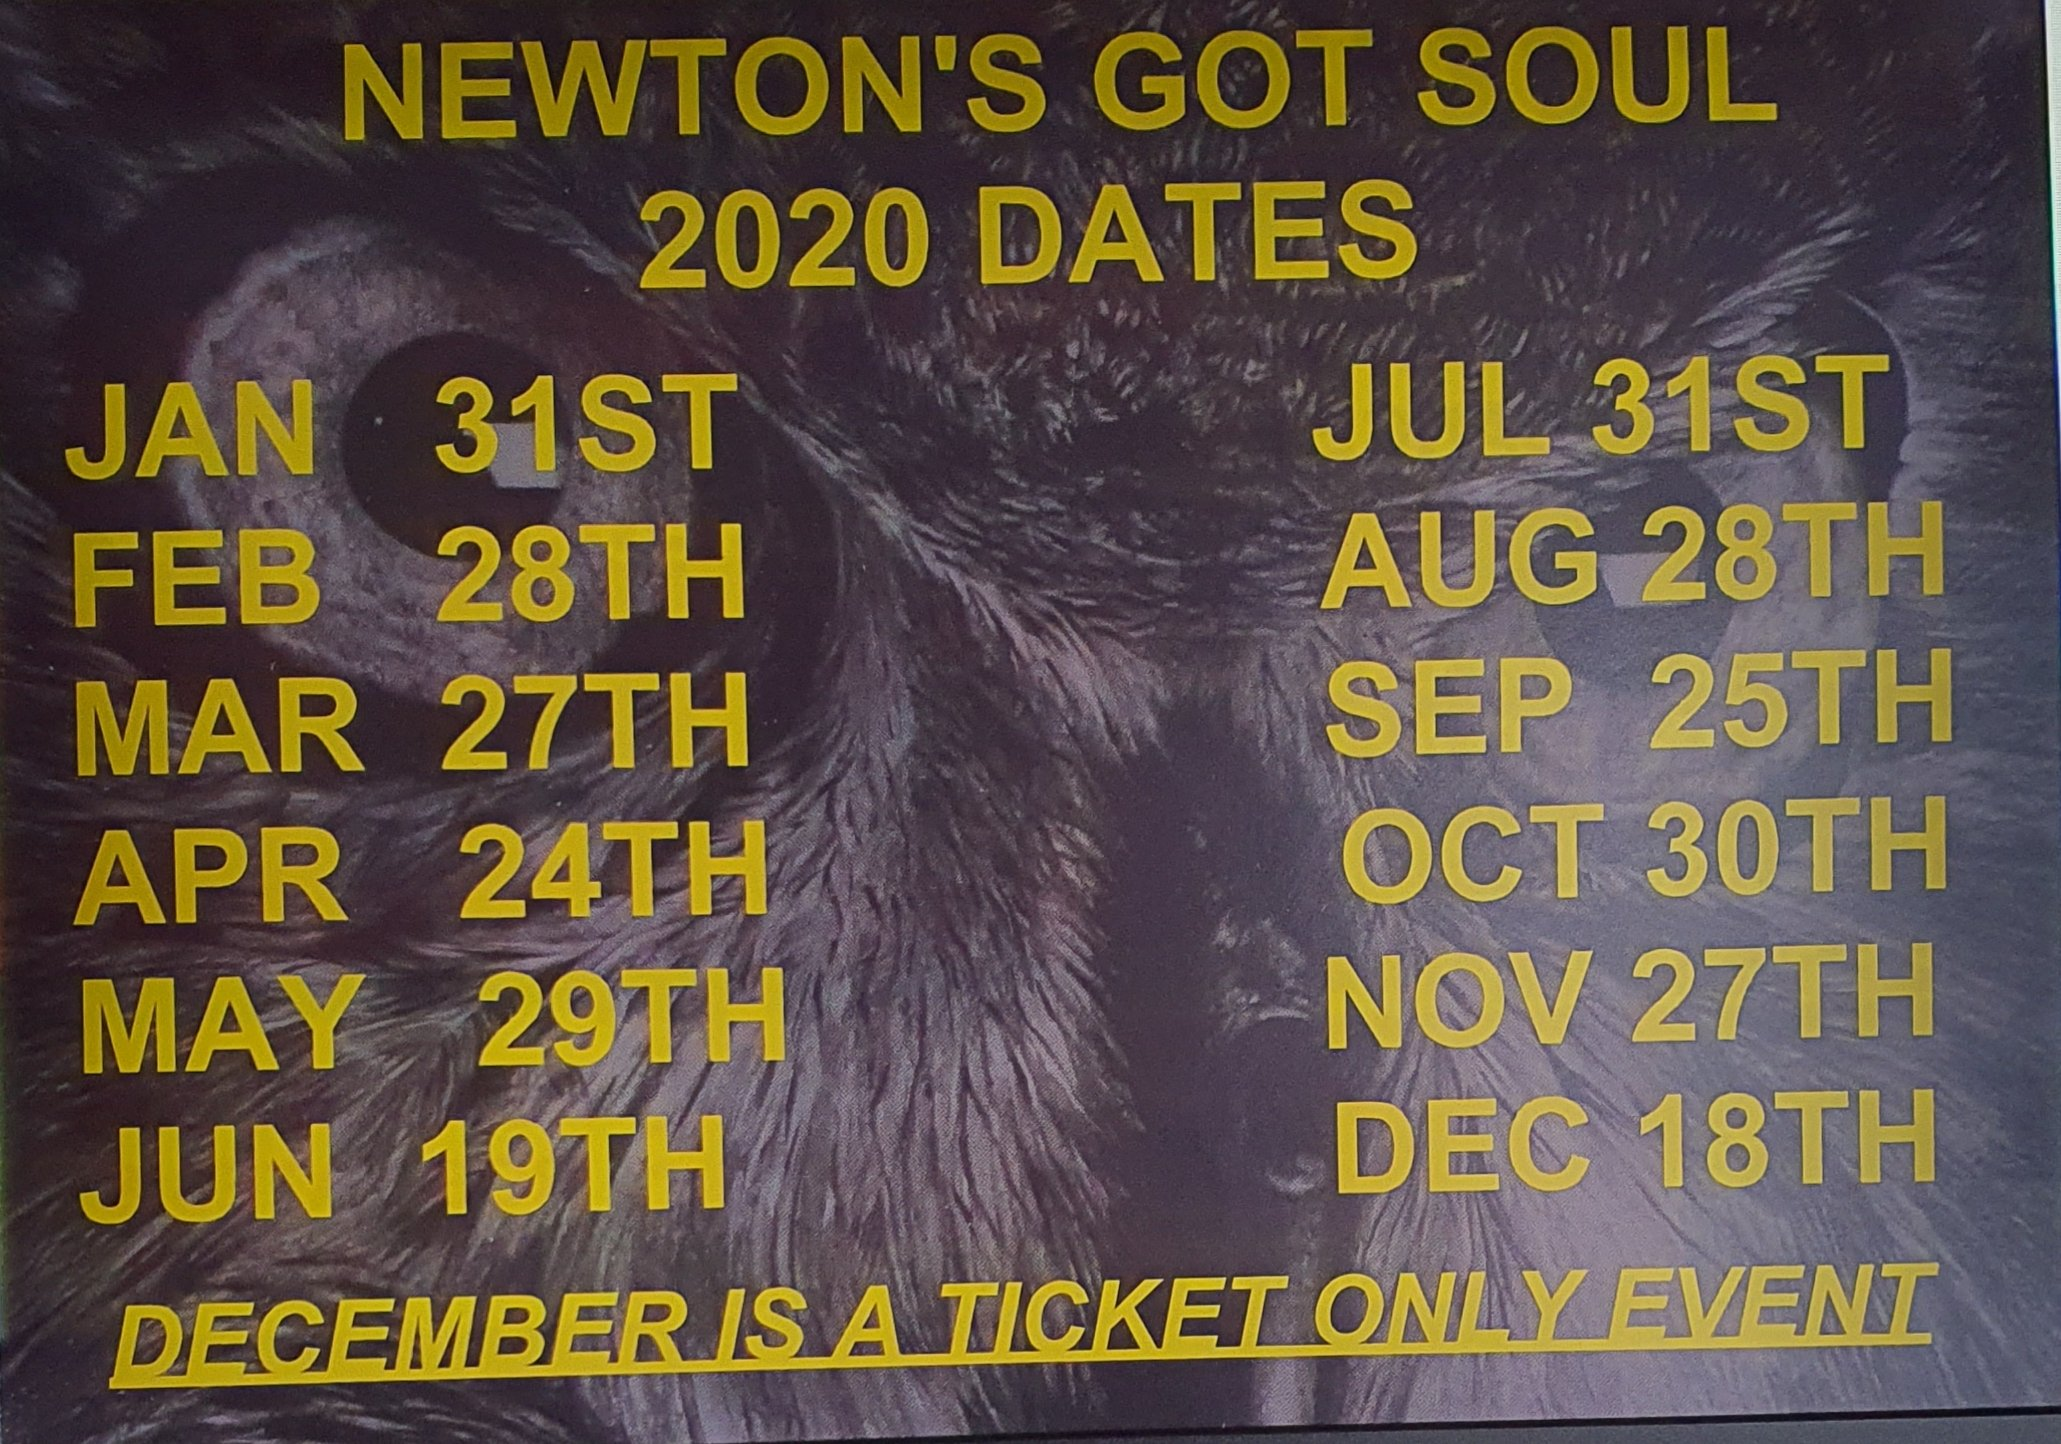 Newtons Got Soul Monthly Soul Night flyer